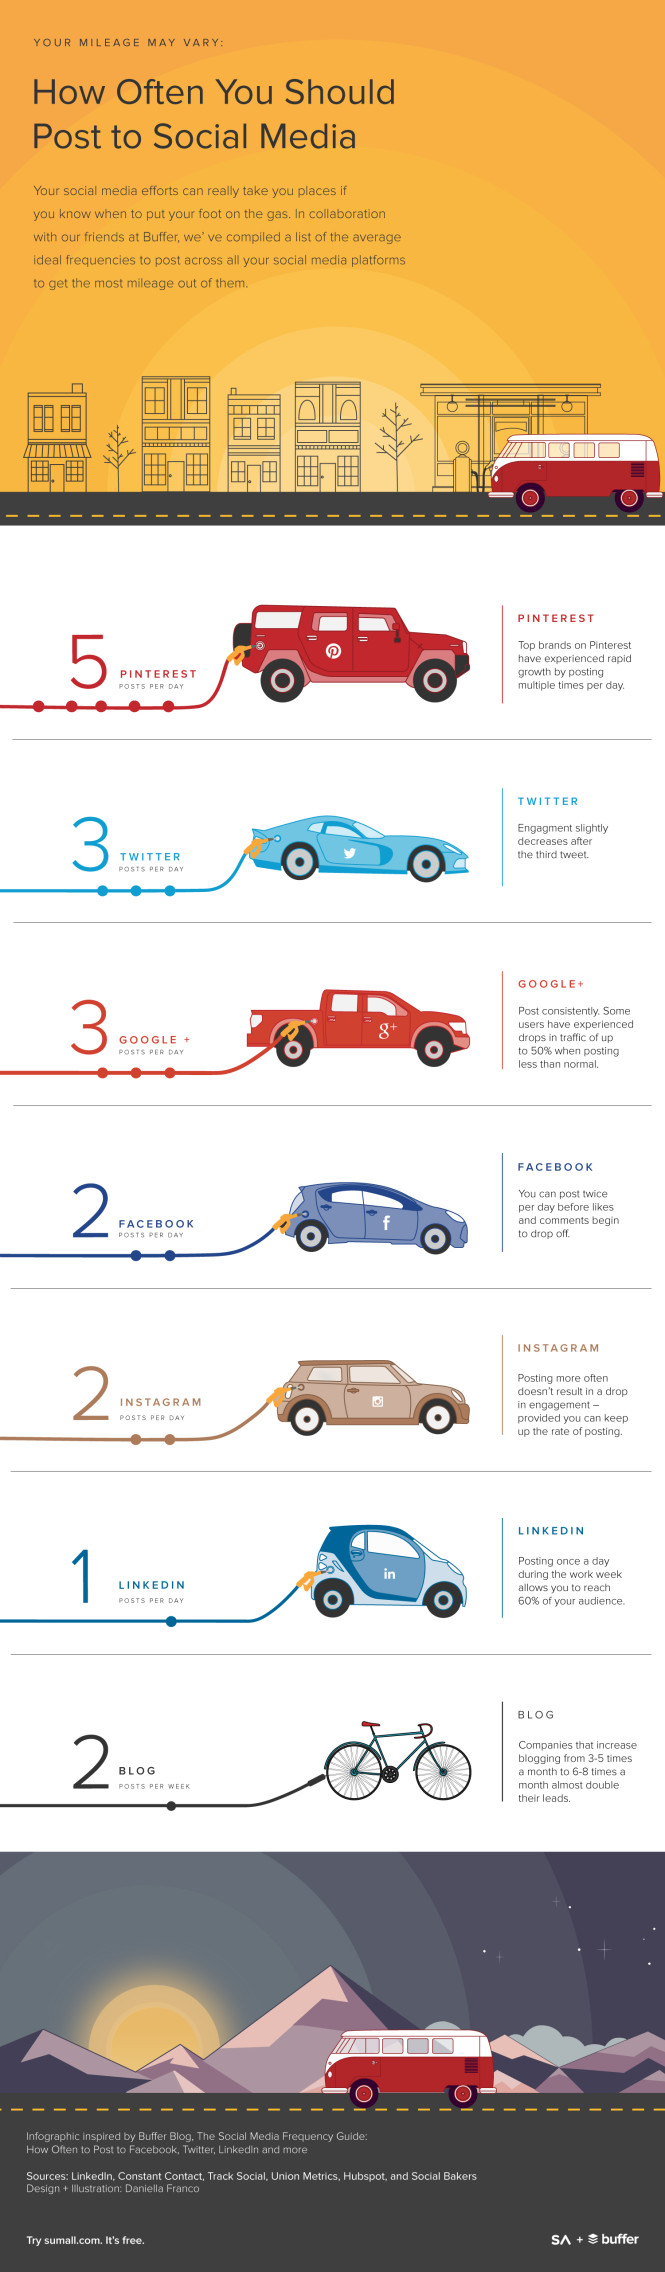 infographic-how-often-to-post-twitter-facebook-social-media